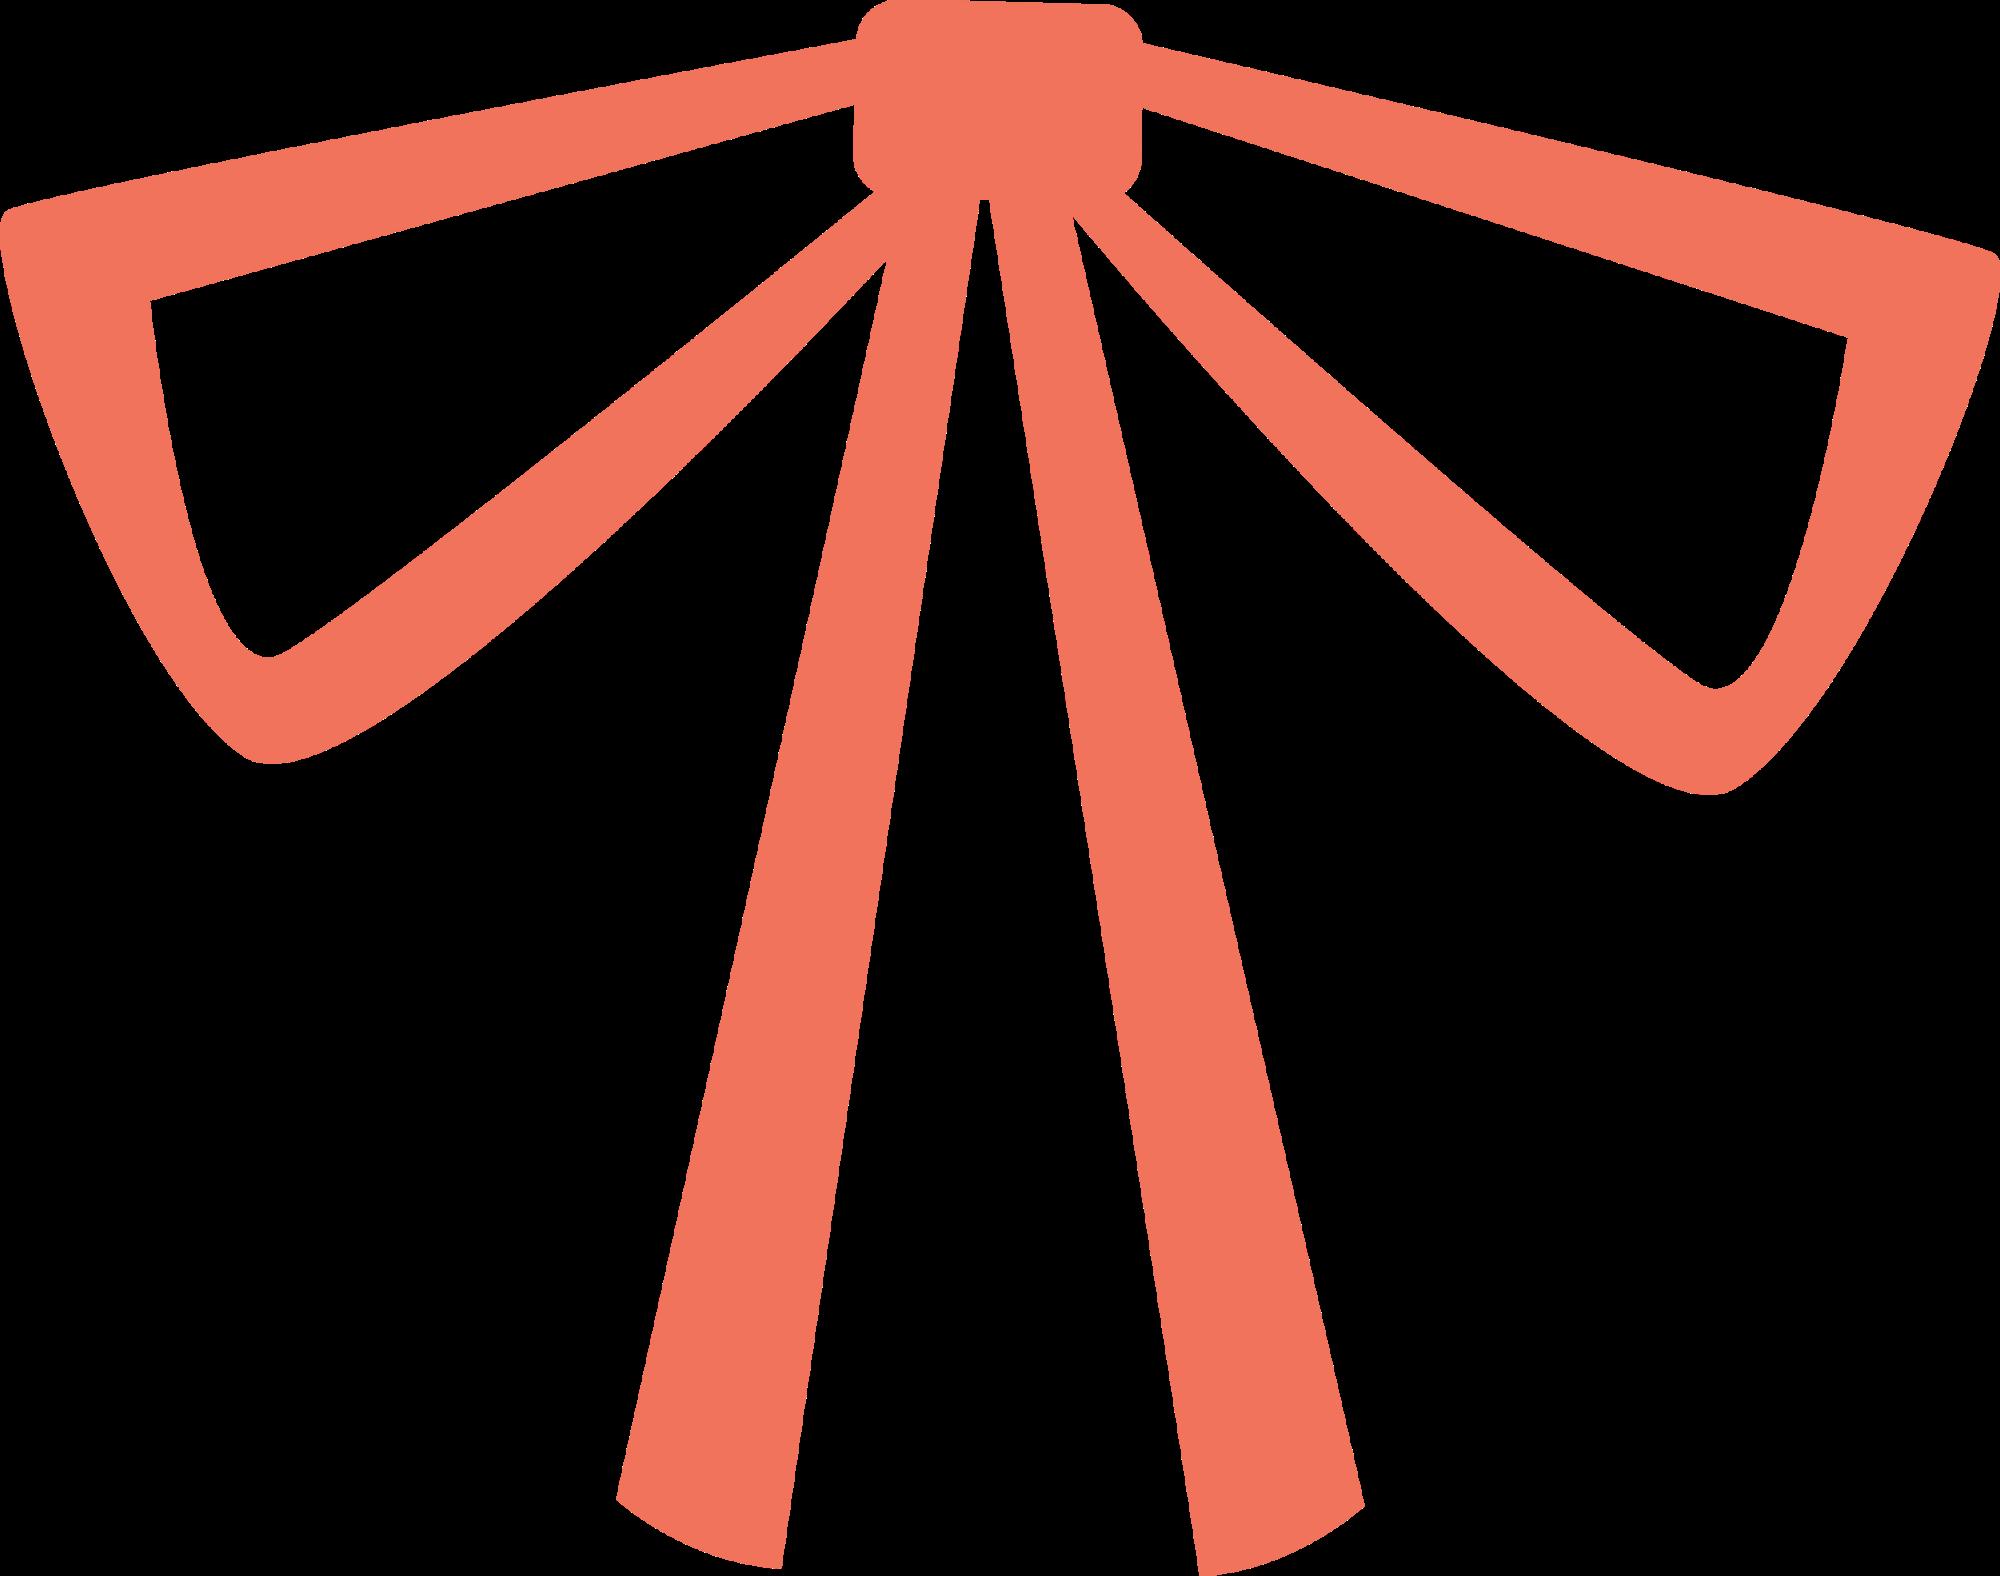 Butterfly shoelace knot clip. Watermelon clipart triangle sandwich